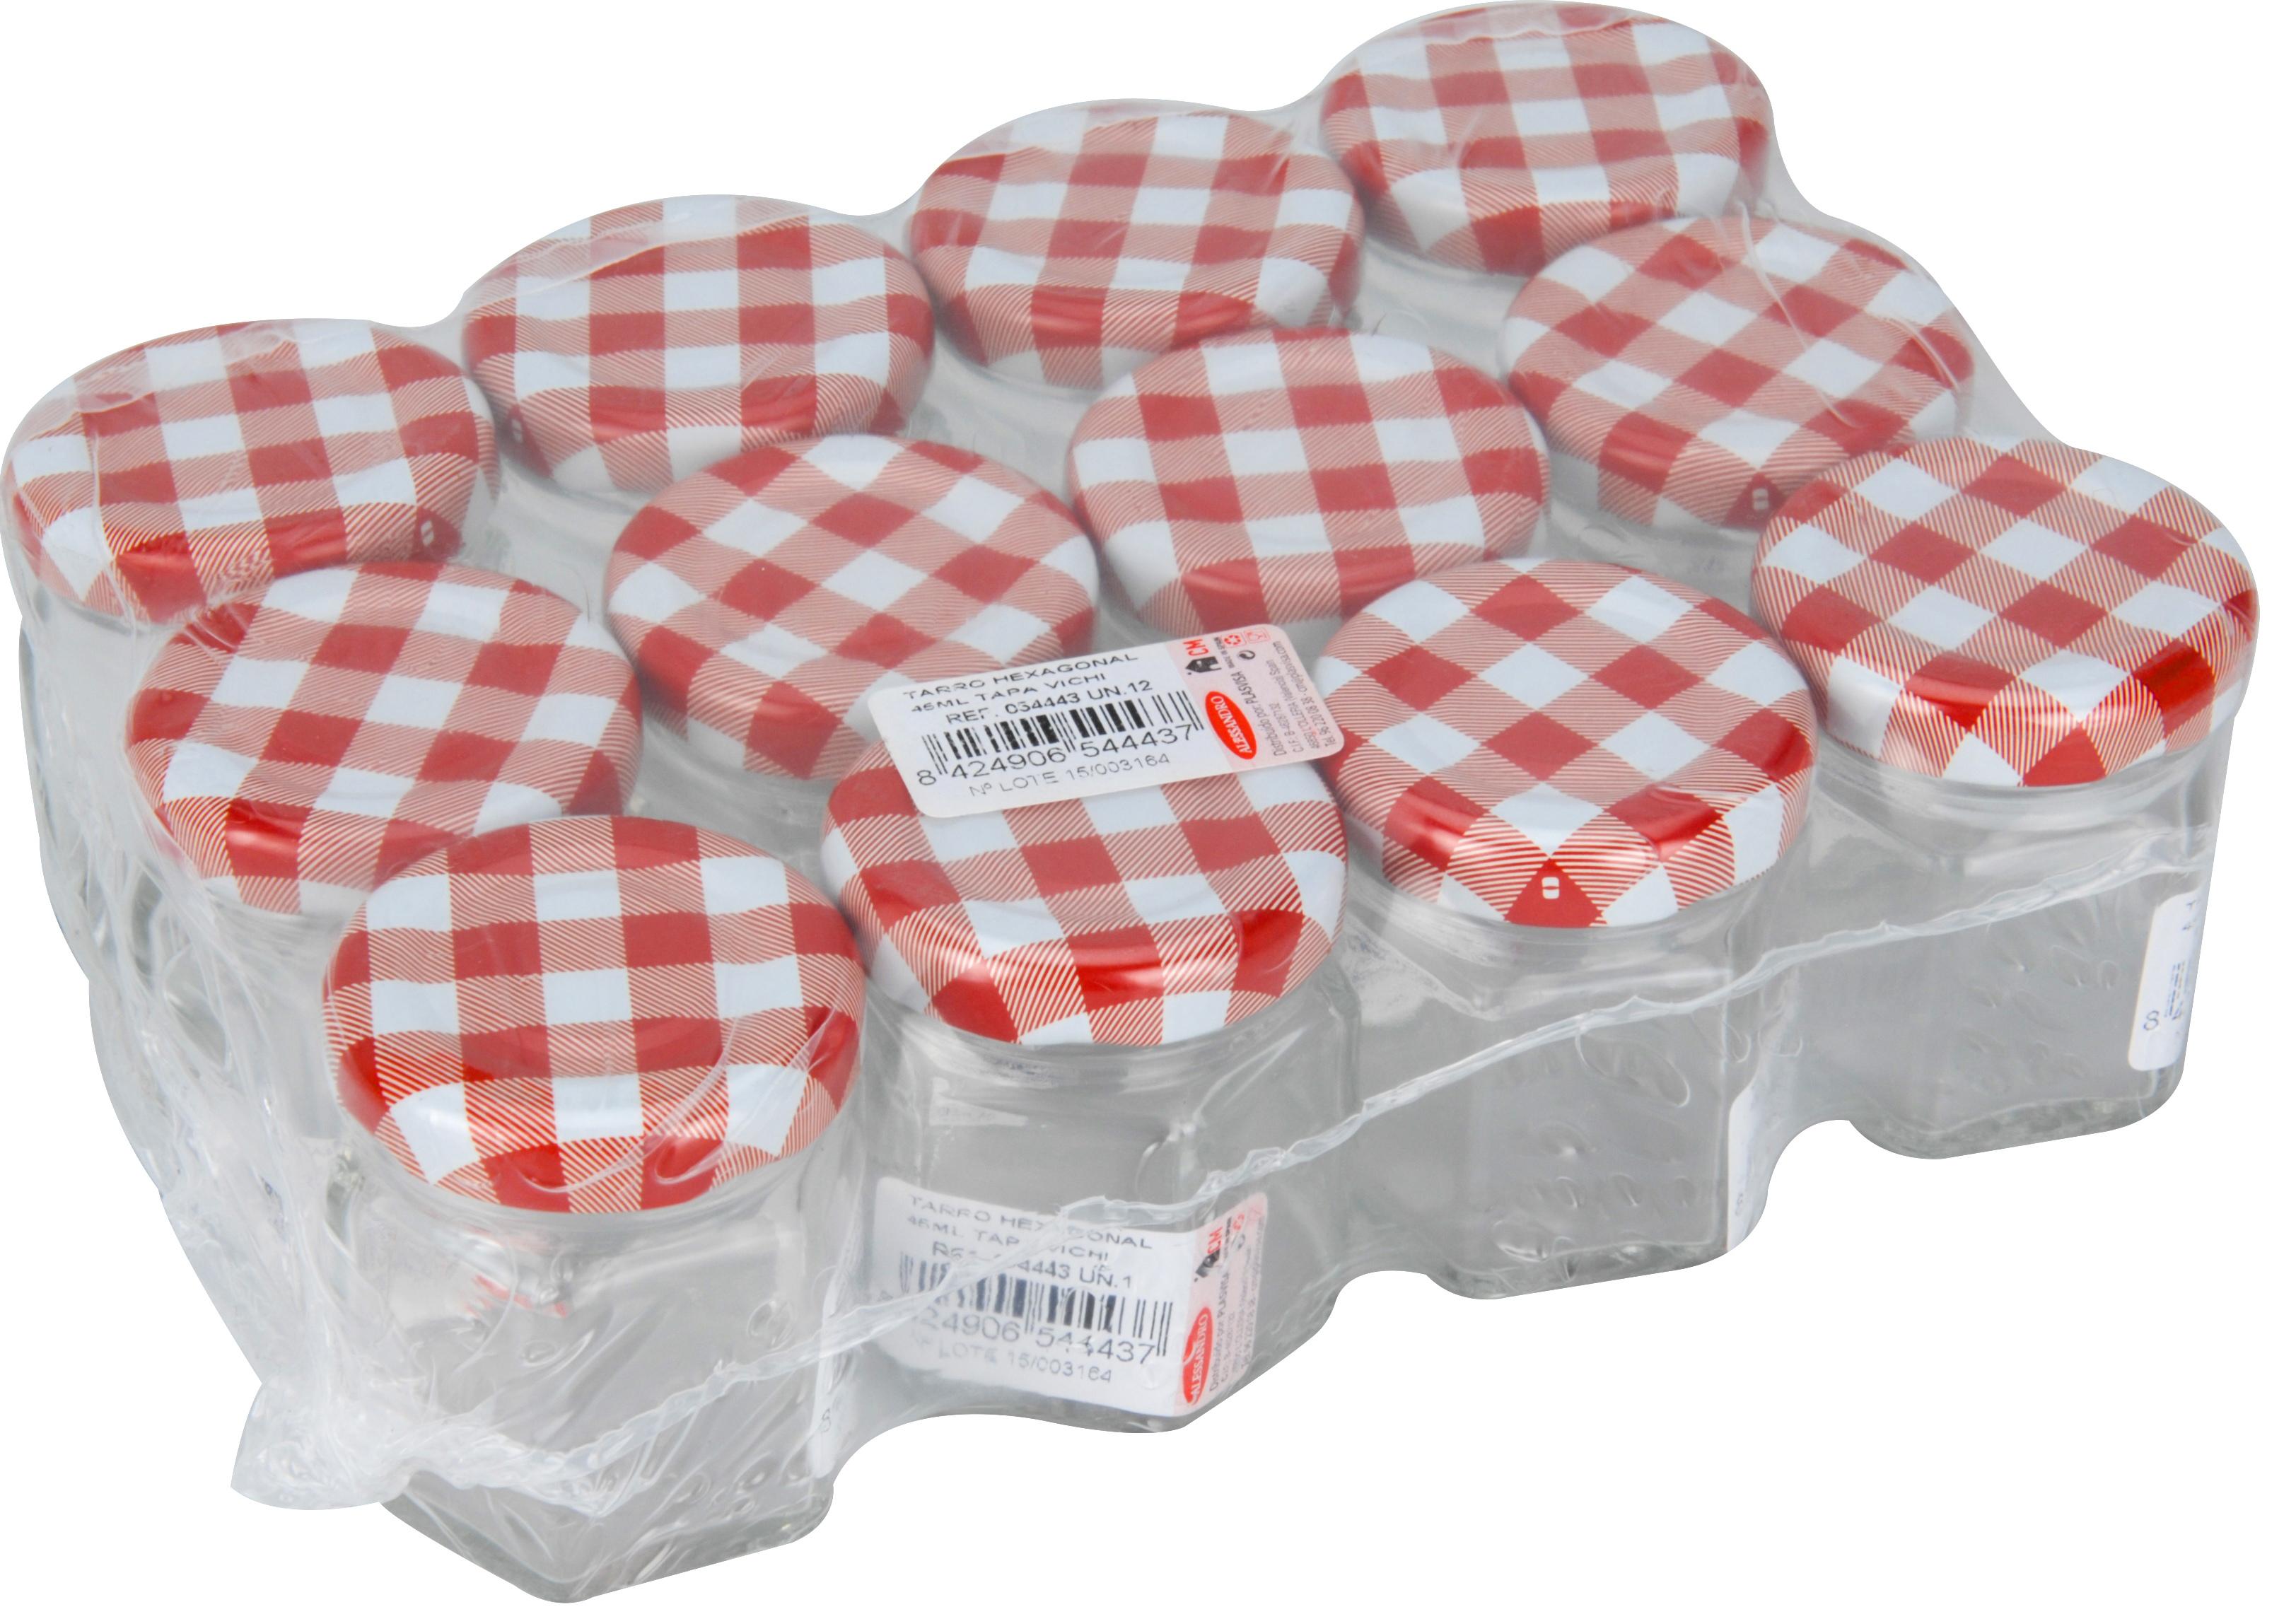 Glass Jam Honey Pickle Food Preserve Chutney Jars Metal Cap Lids ...